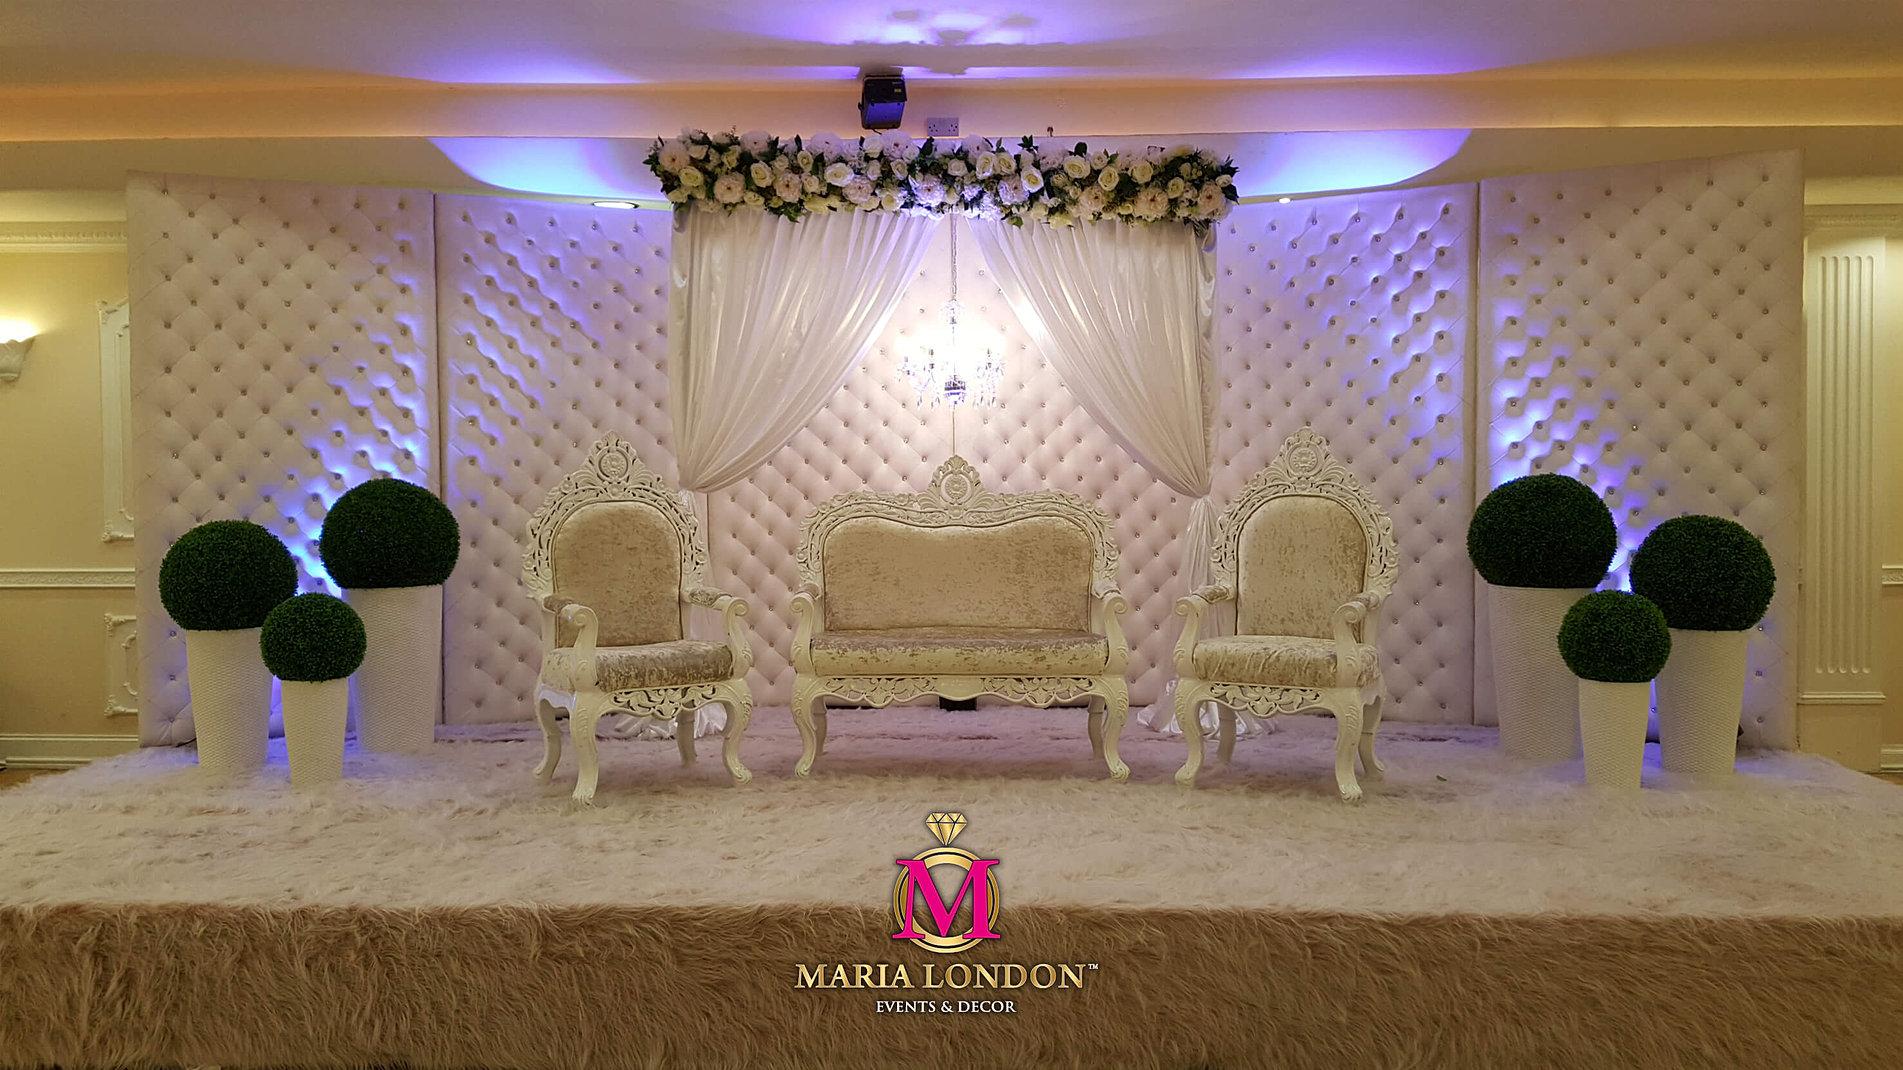 Event Decor London Maria London Events Professional Wedding Planners Bespoke